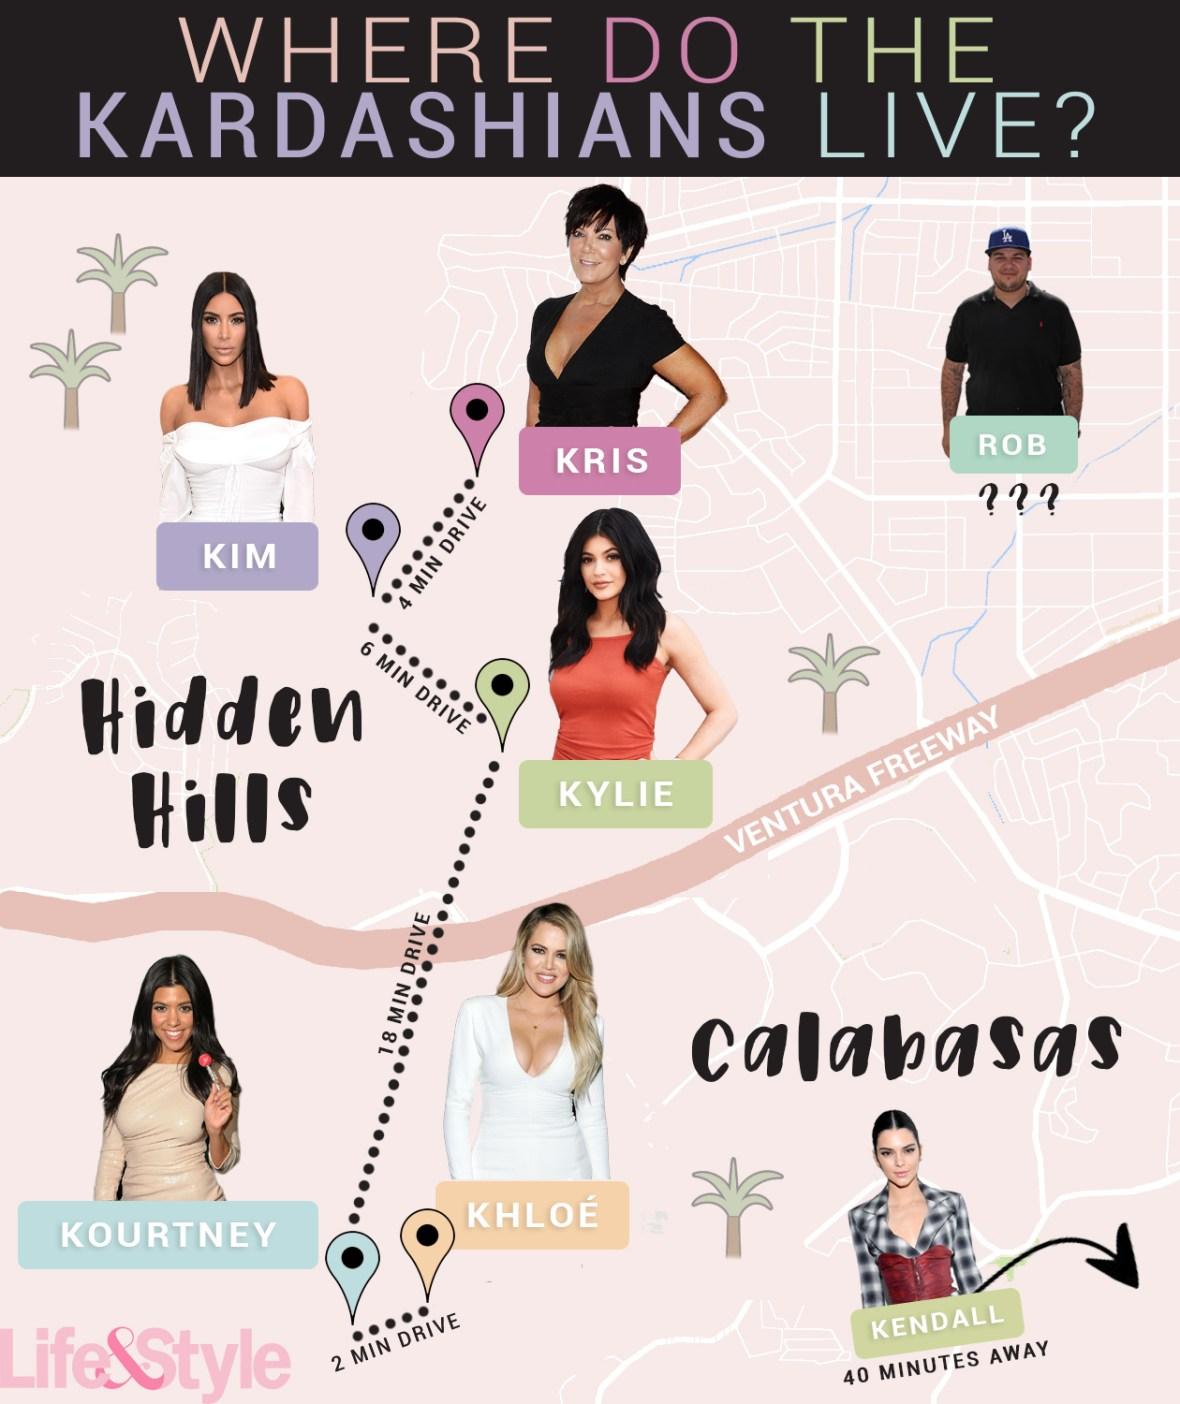 where do the kardashians live